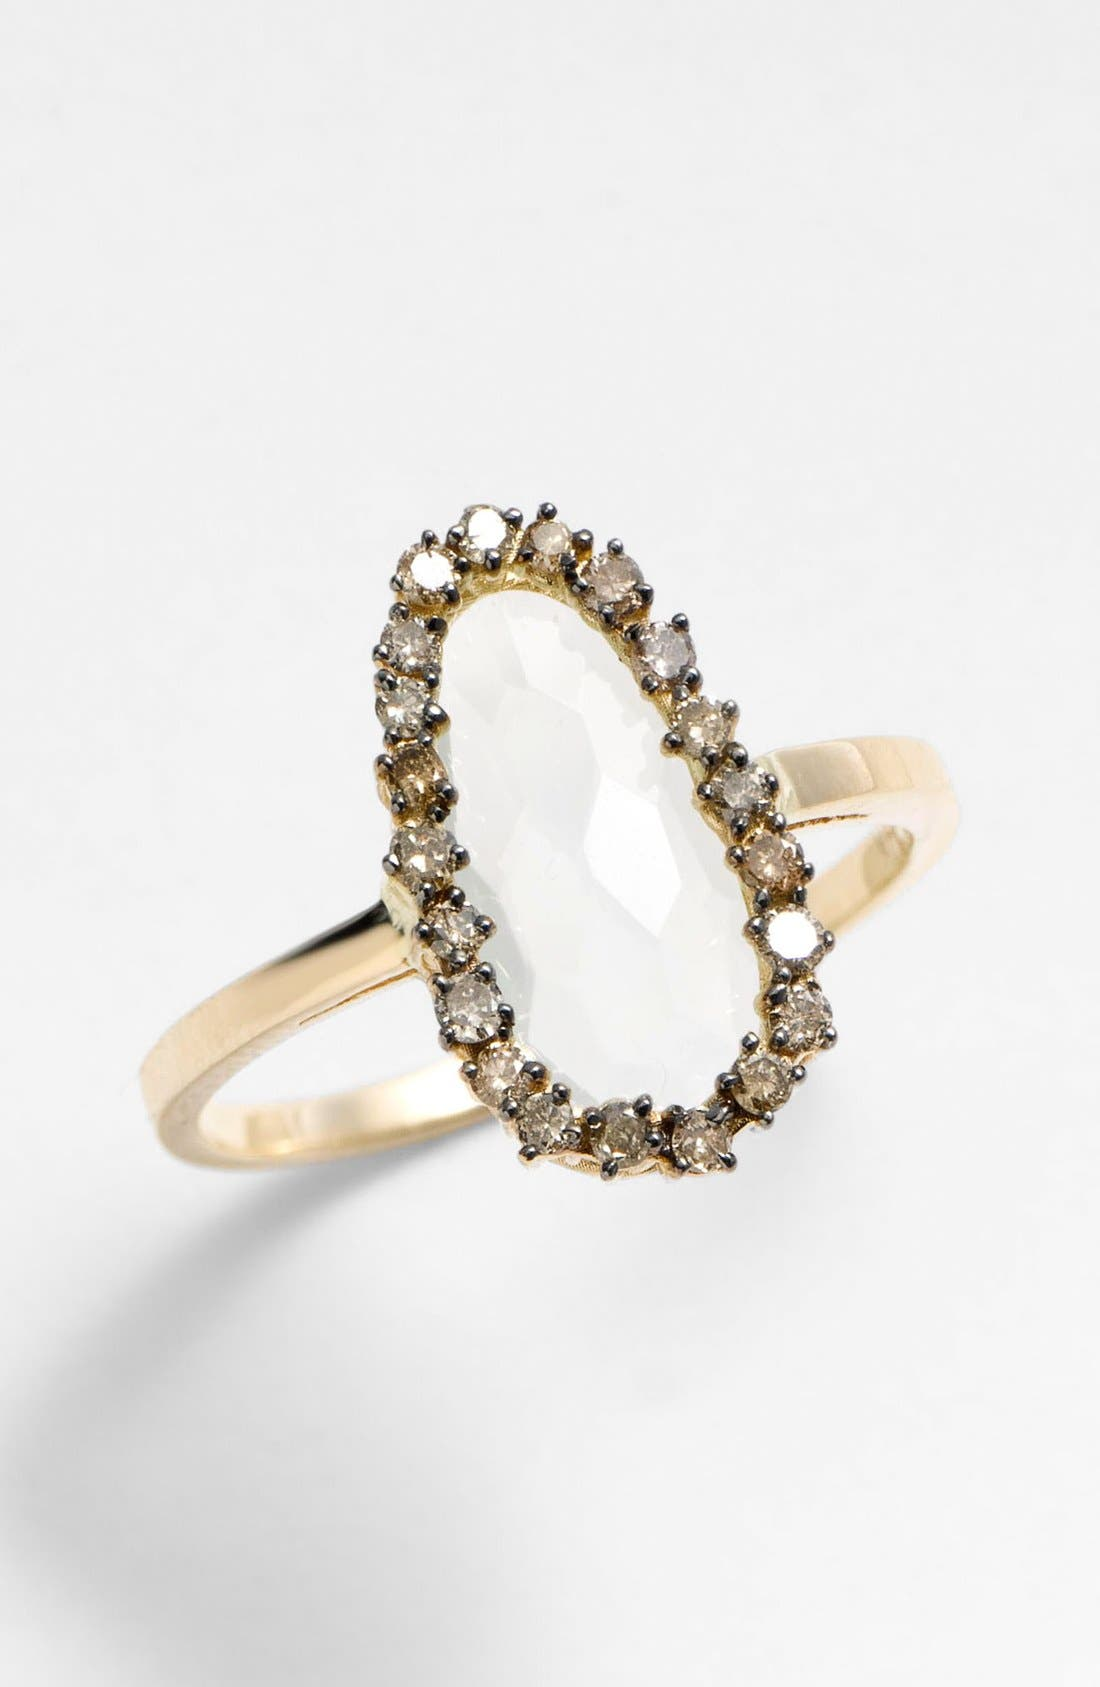 Main Image - KALAN by Suzanne Kalan Pear Stone Ring